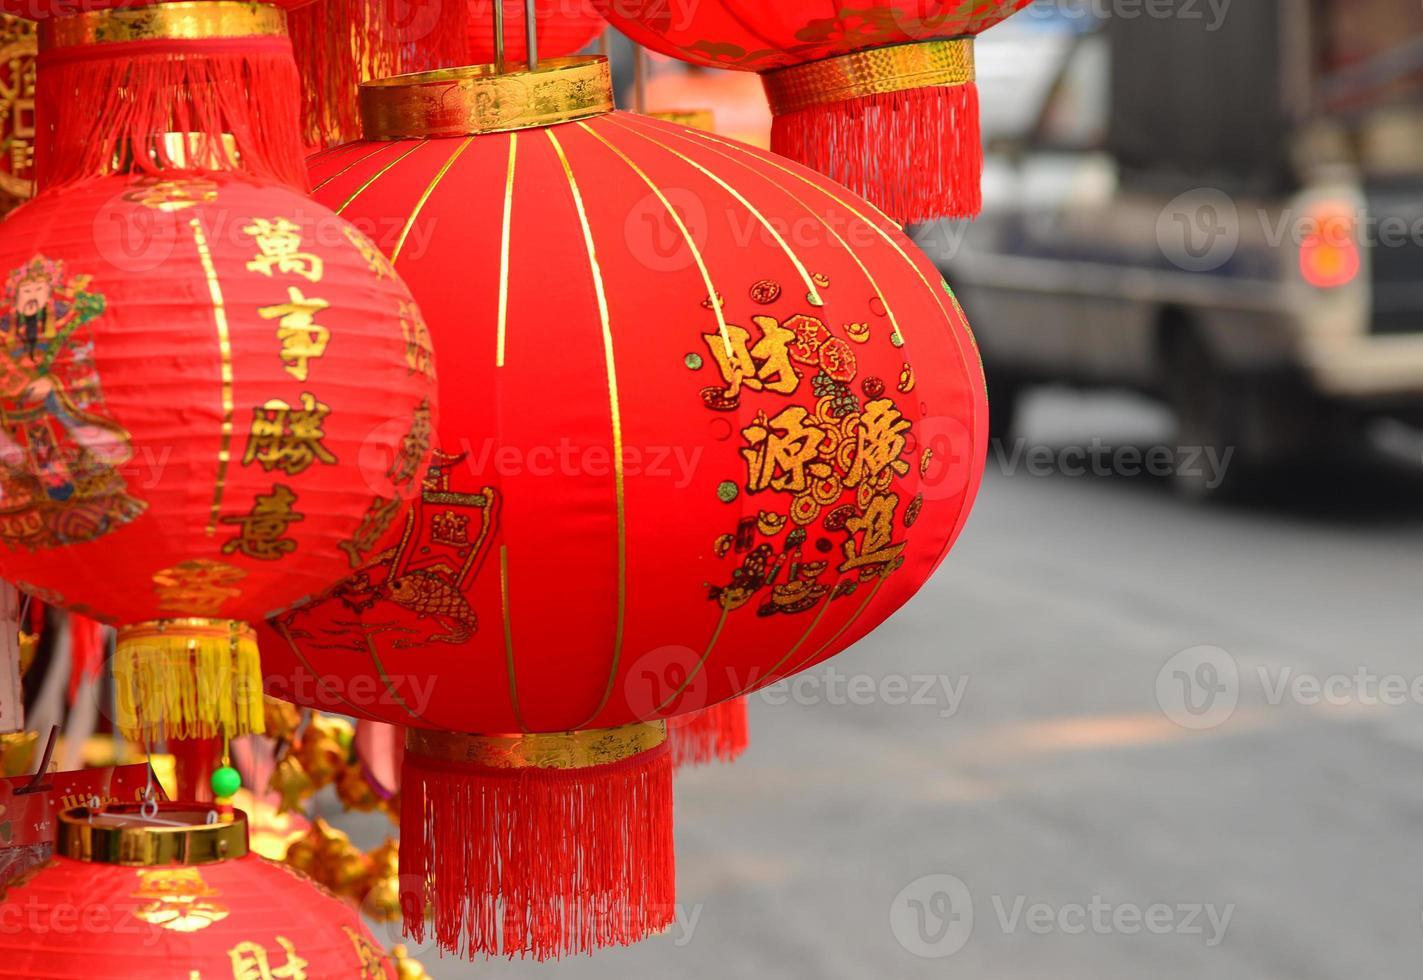 Red Lantern photo